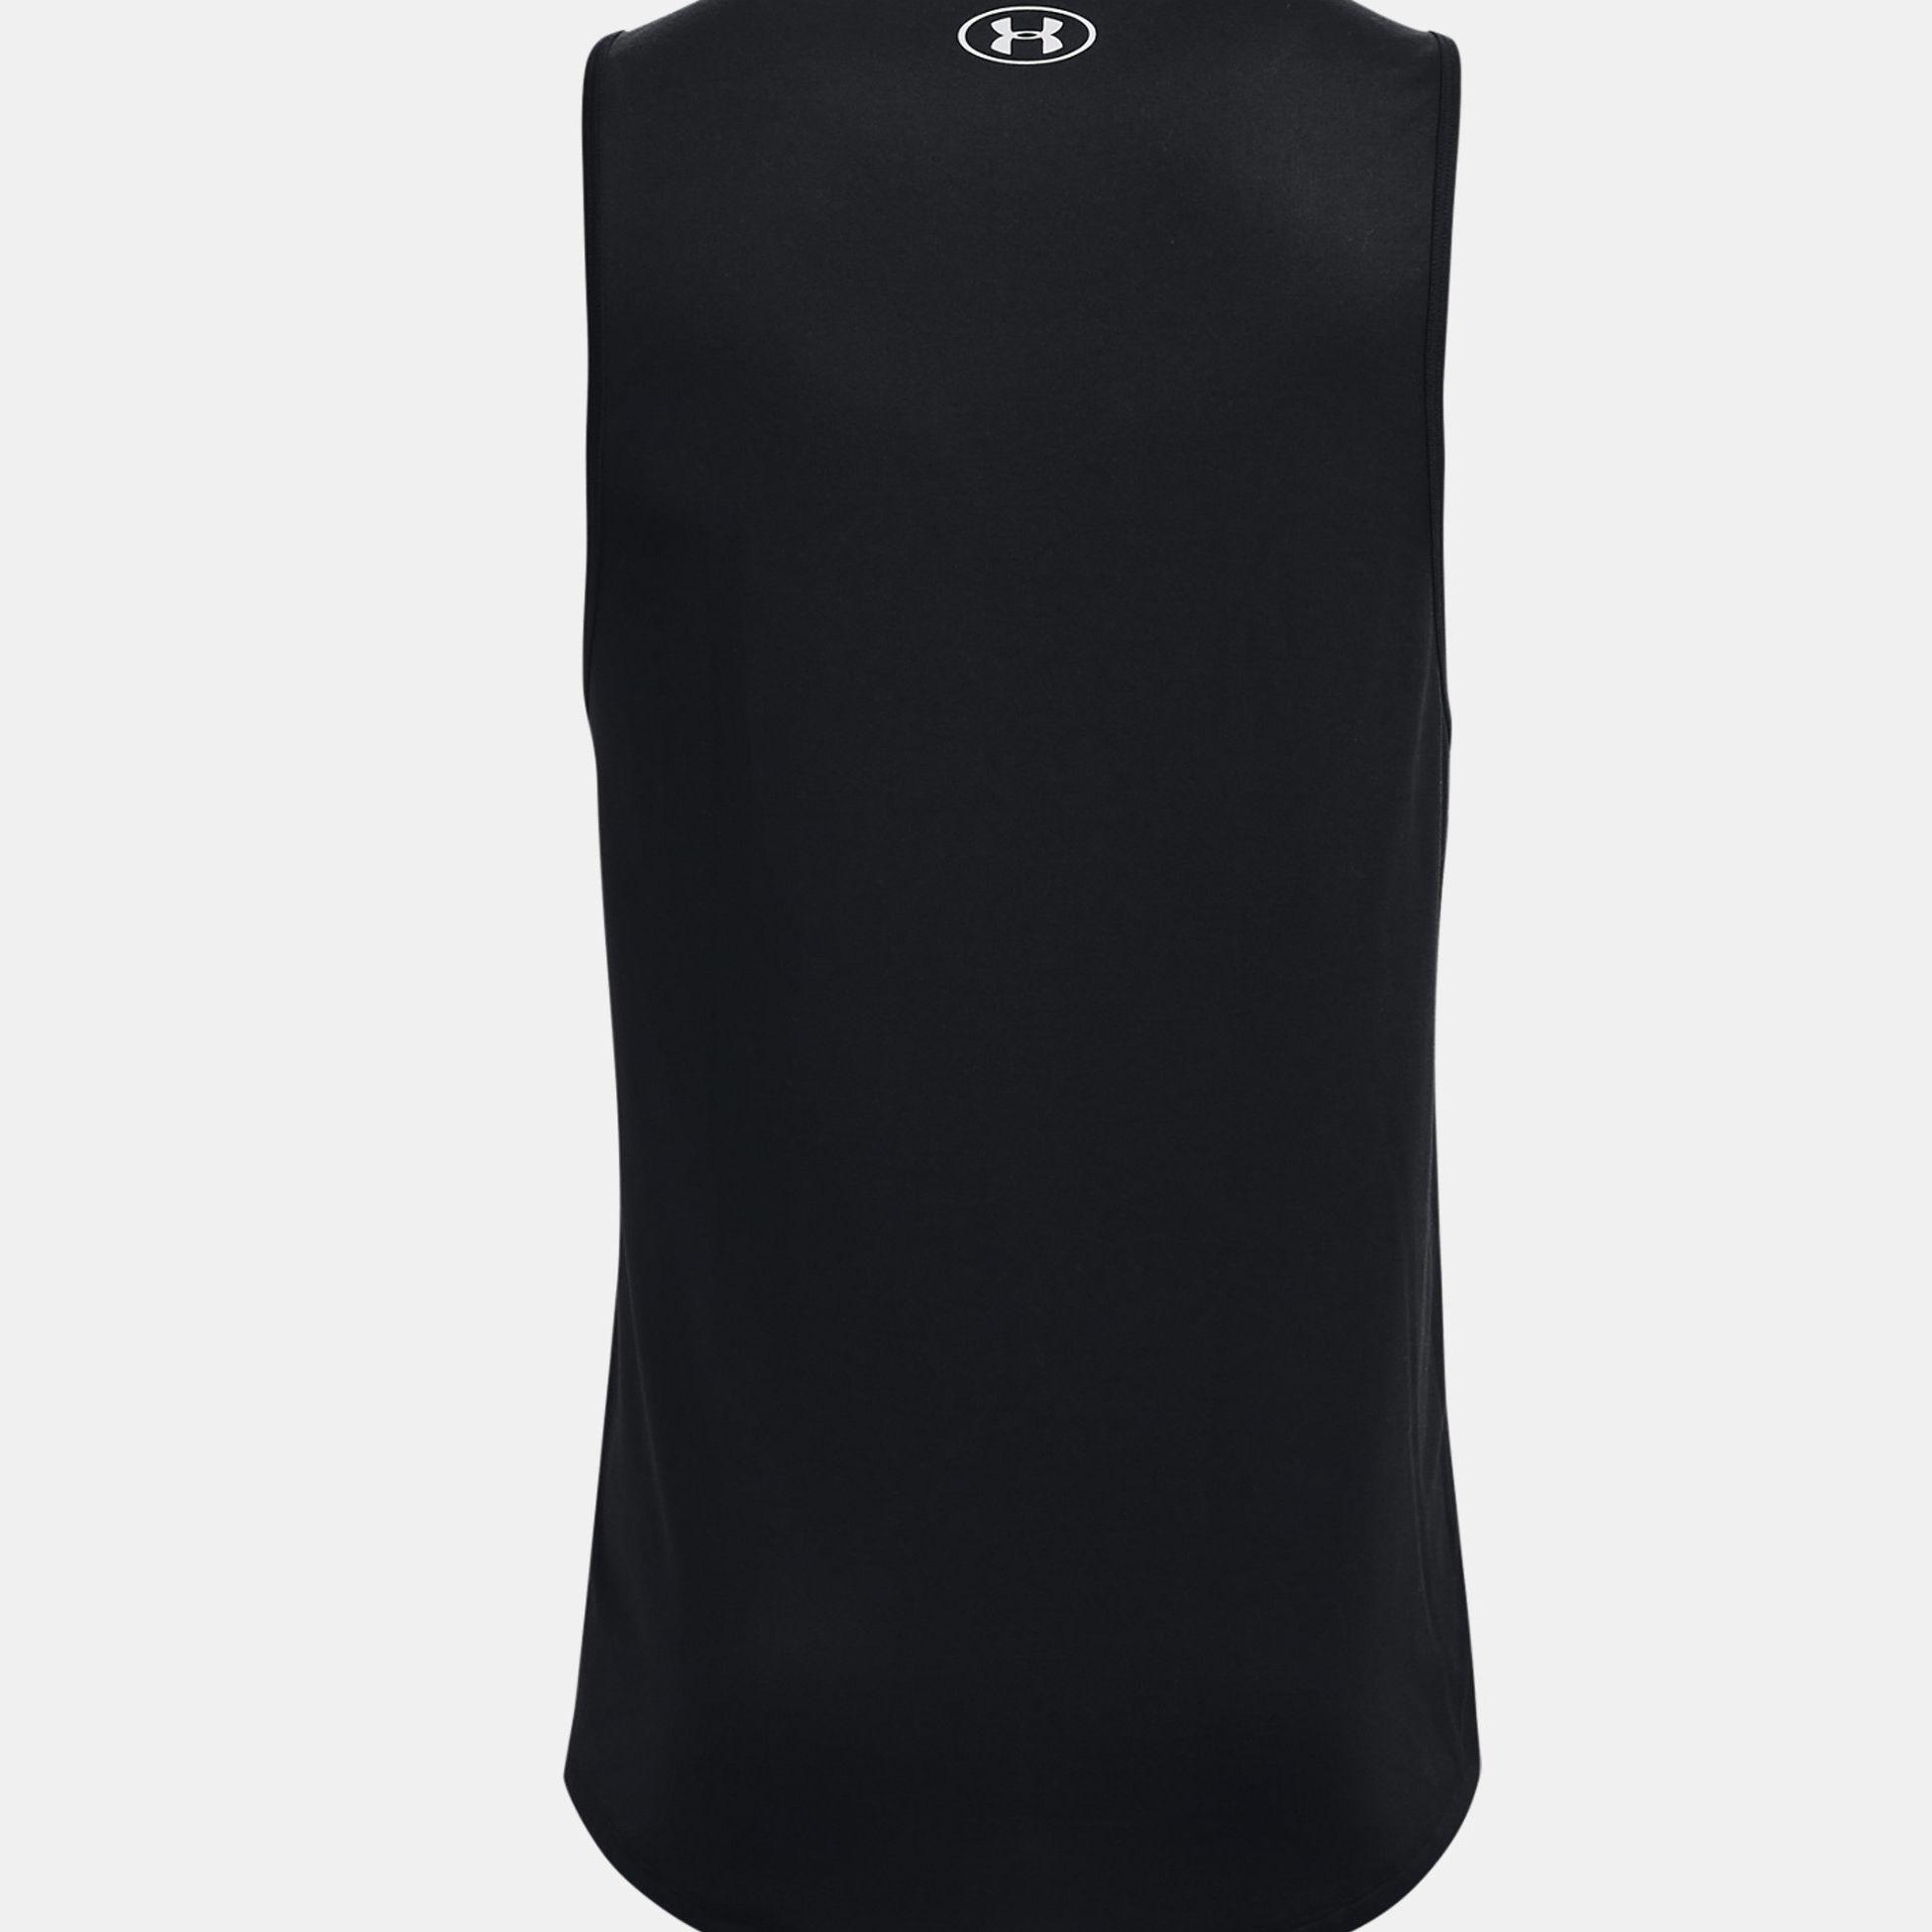 Clothing -  under armour UA Tech 2.0 Signature Tank